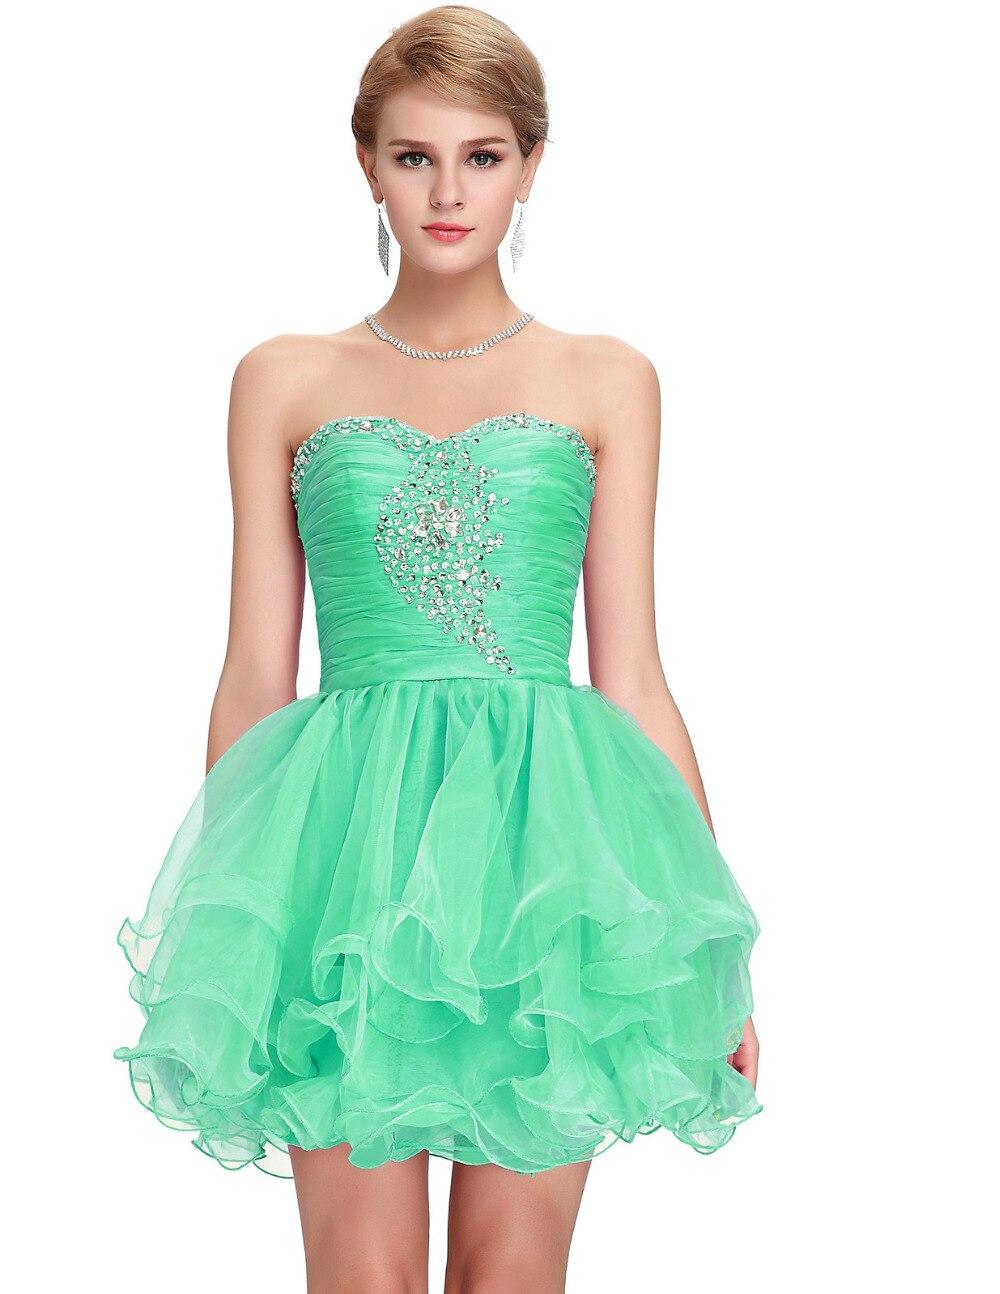 Short Black Bridesmaid Dresses Mint Green Purple Beads Formal Prom ...